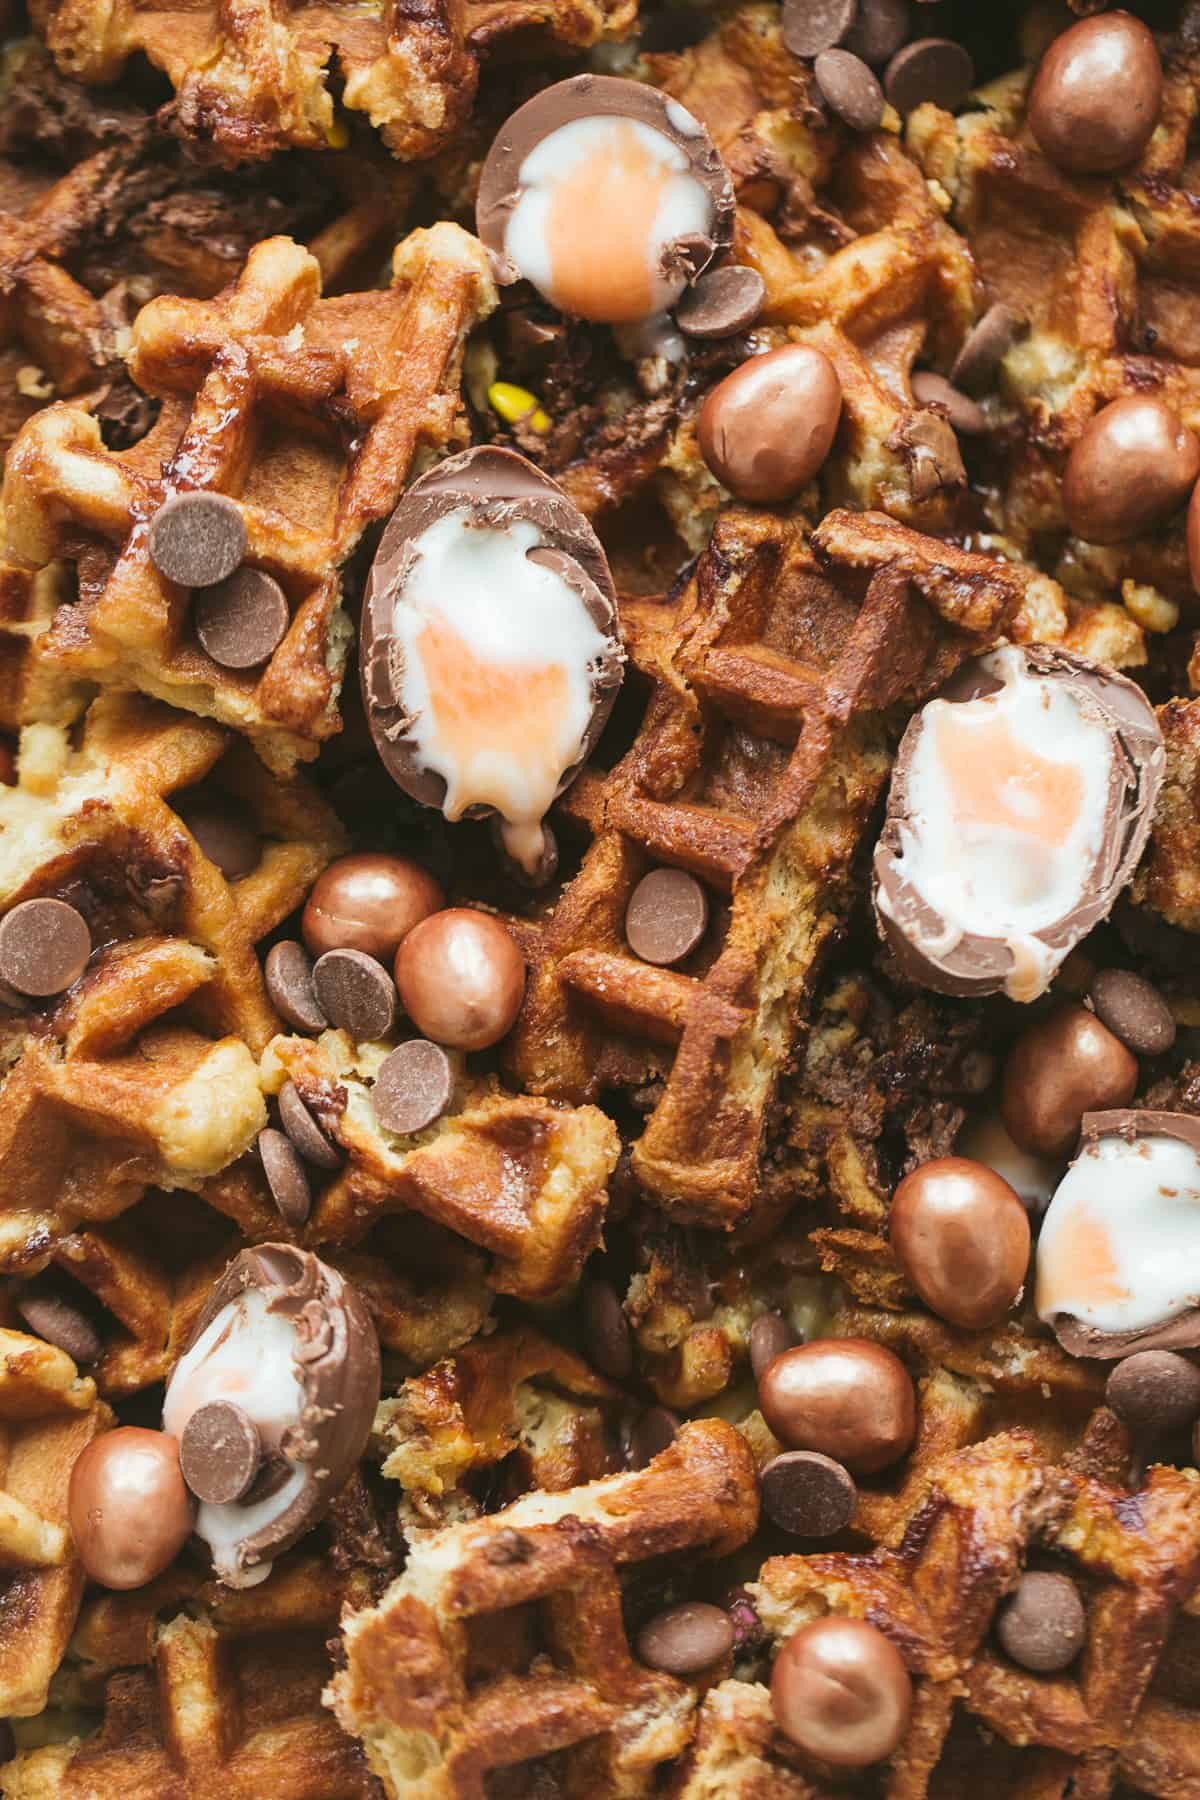 Baked waffles with Cadbury Creme Eggs and Galaxy Enchanted Eggs and custard.